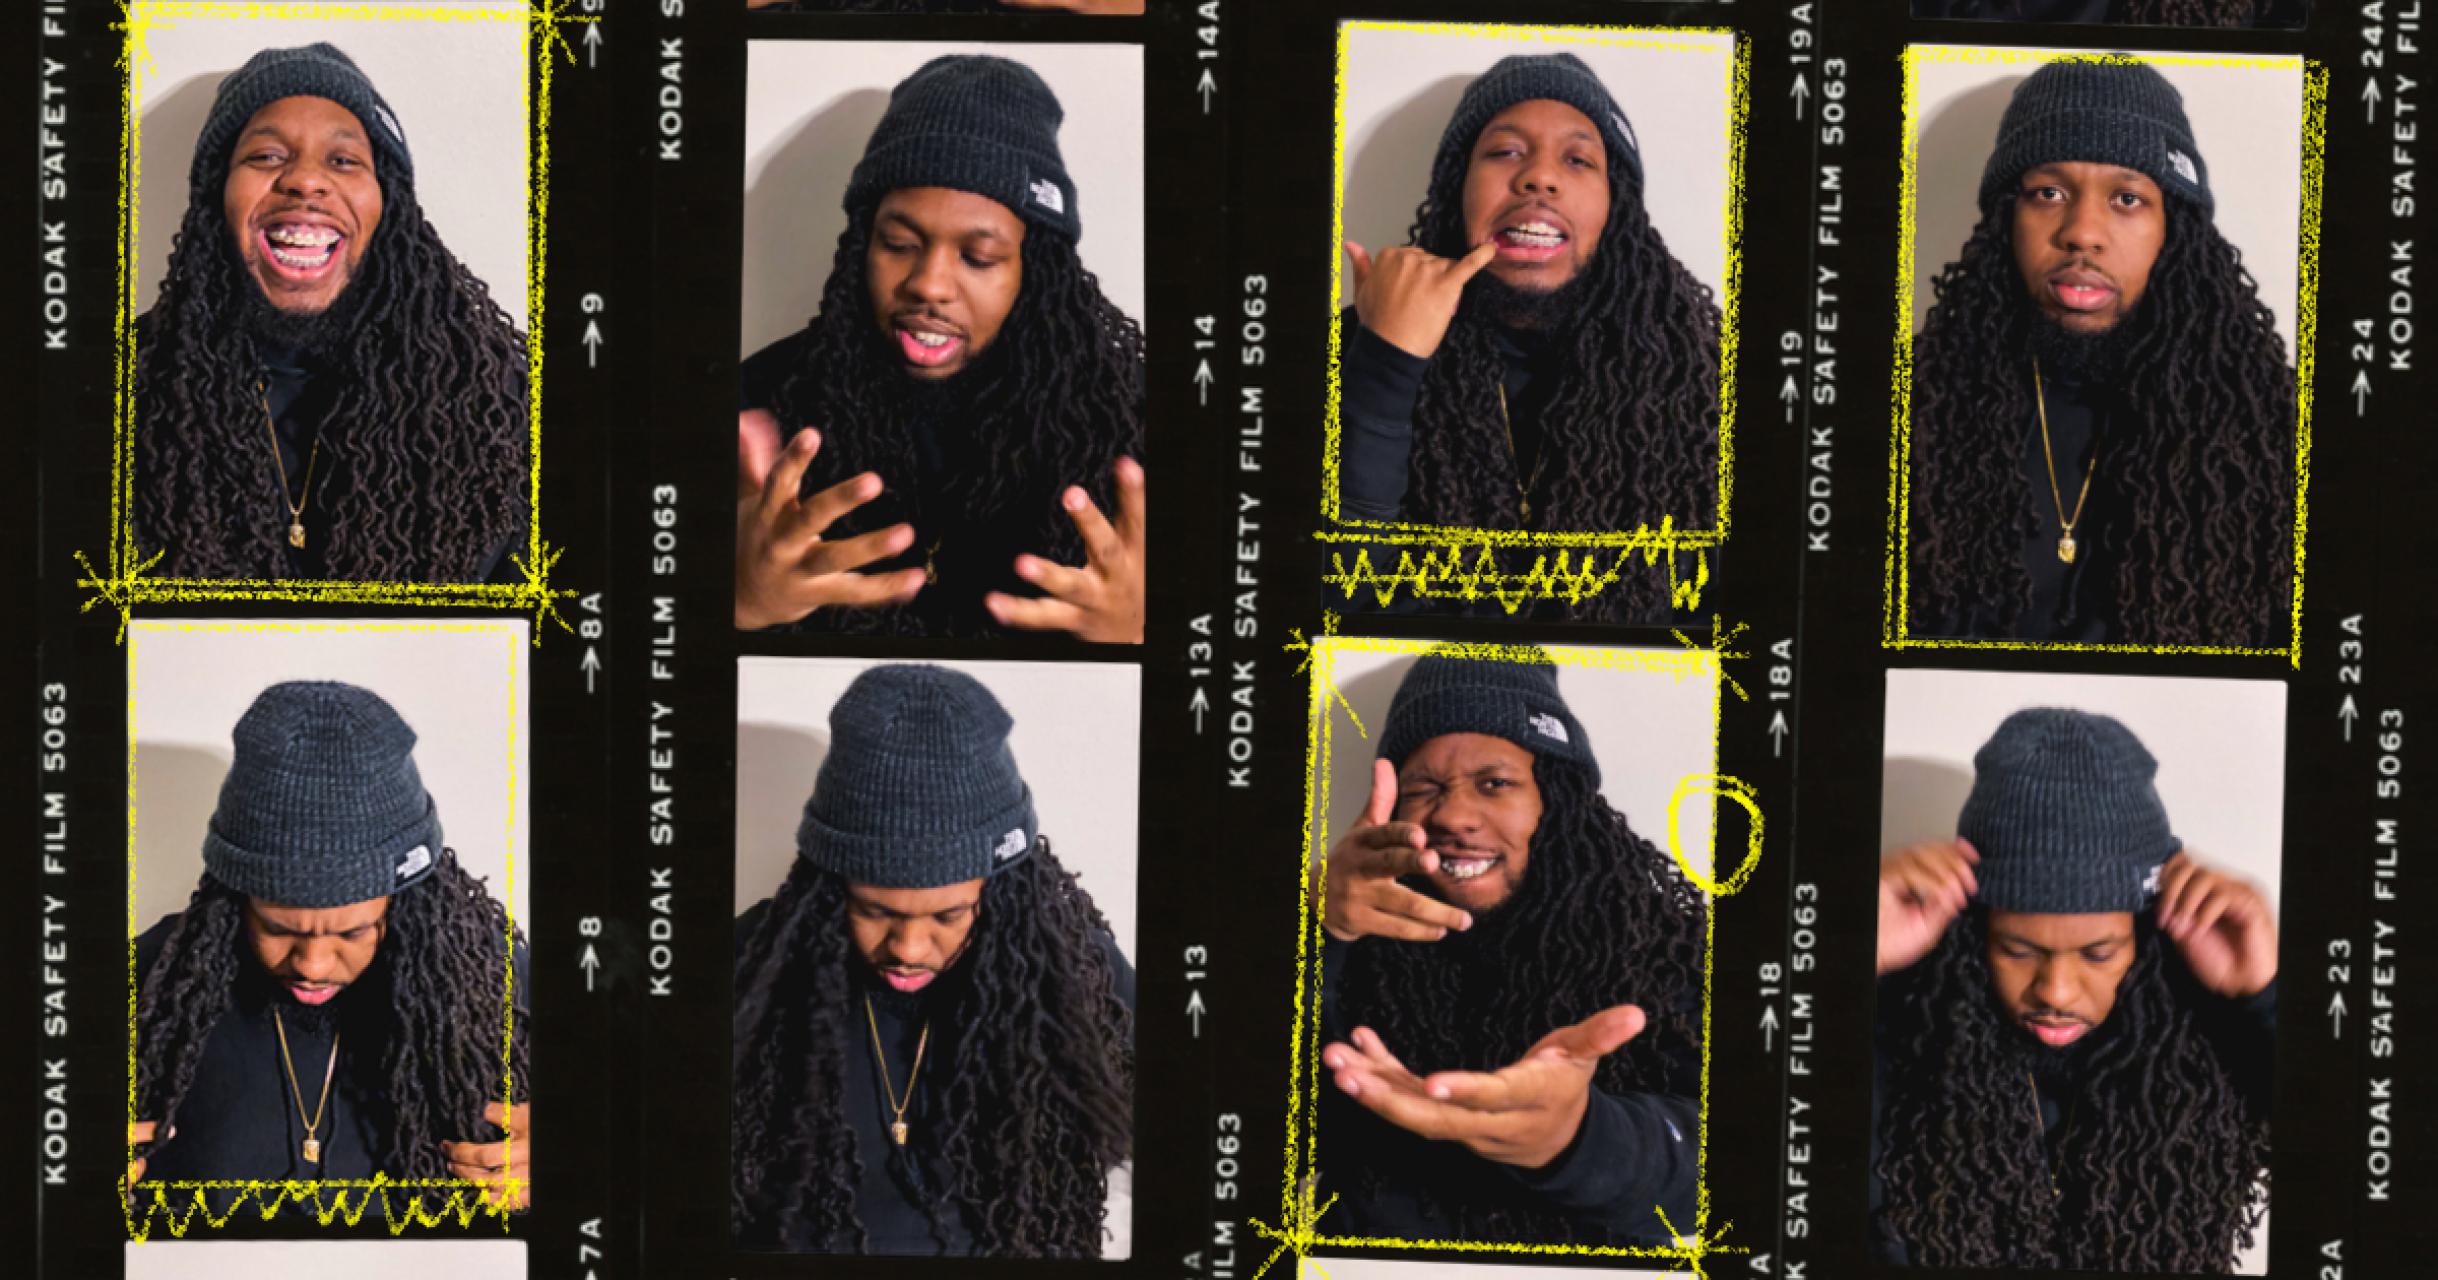 8 photos of Jerm Juice stylized in strips of film